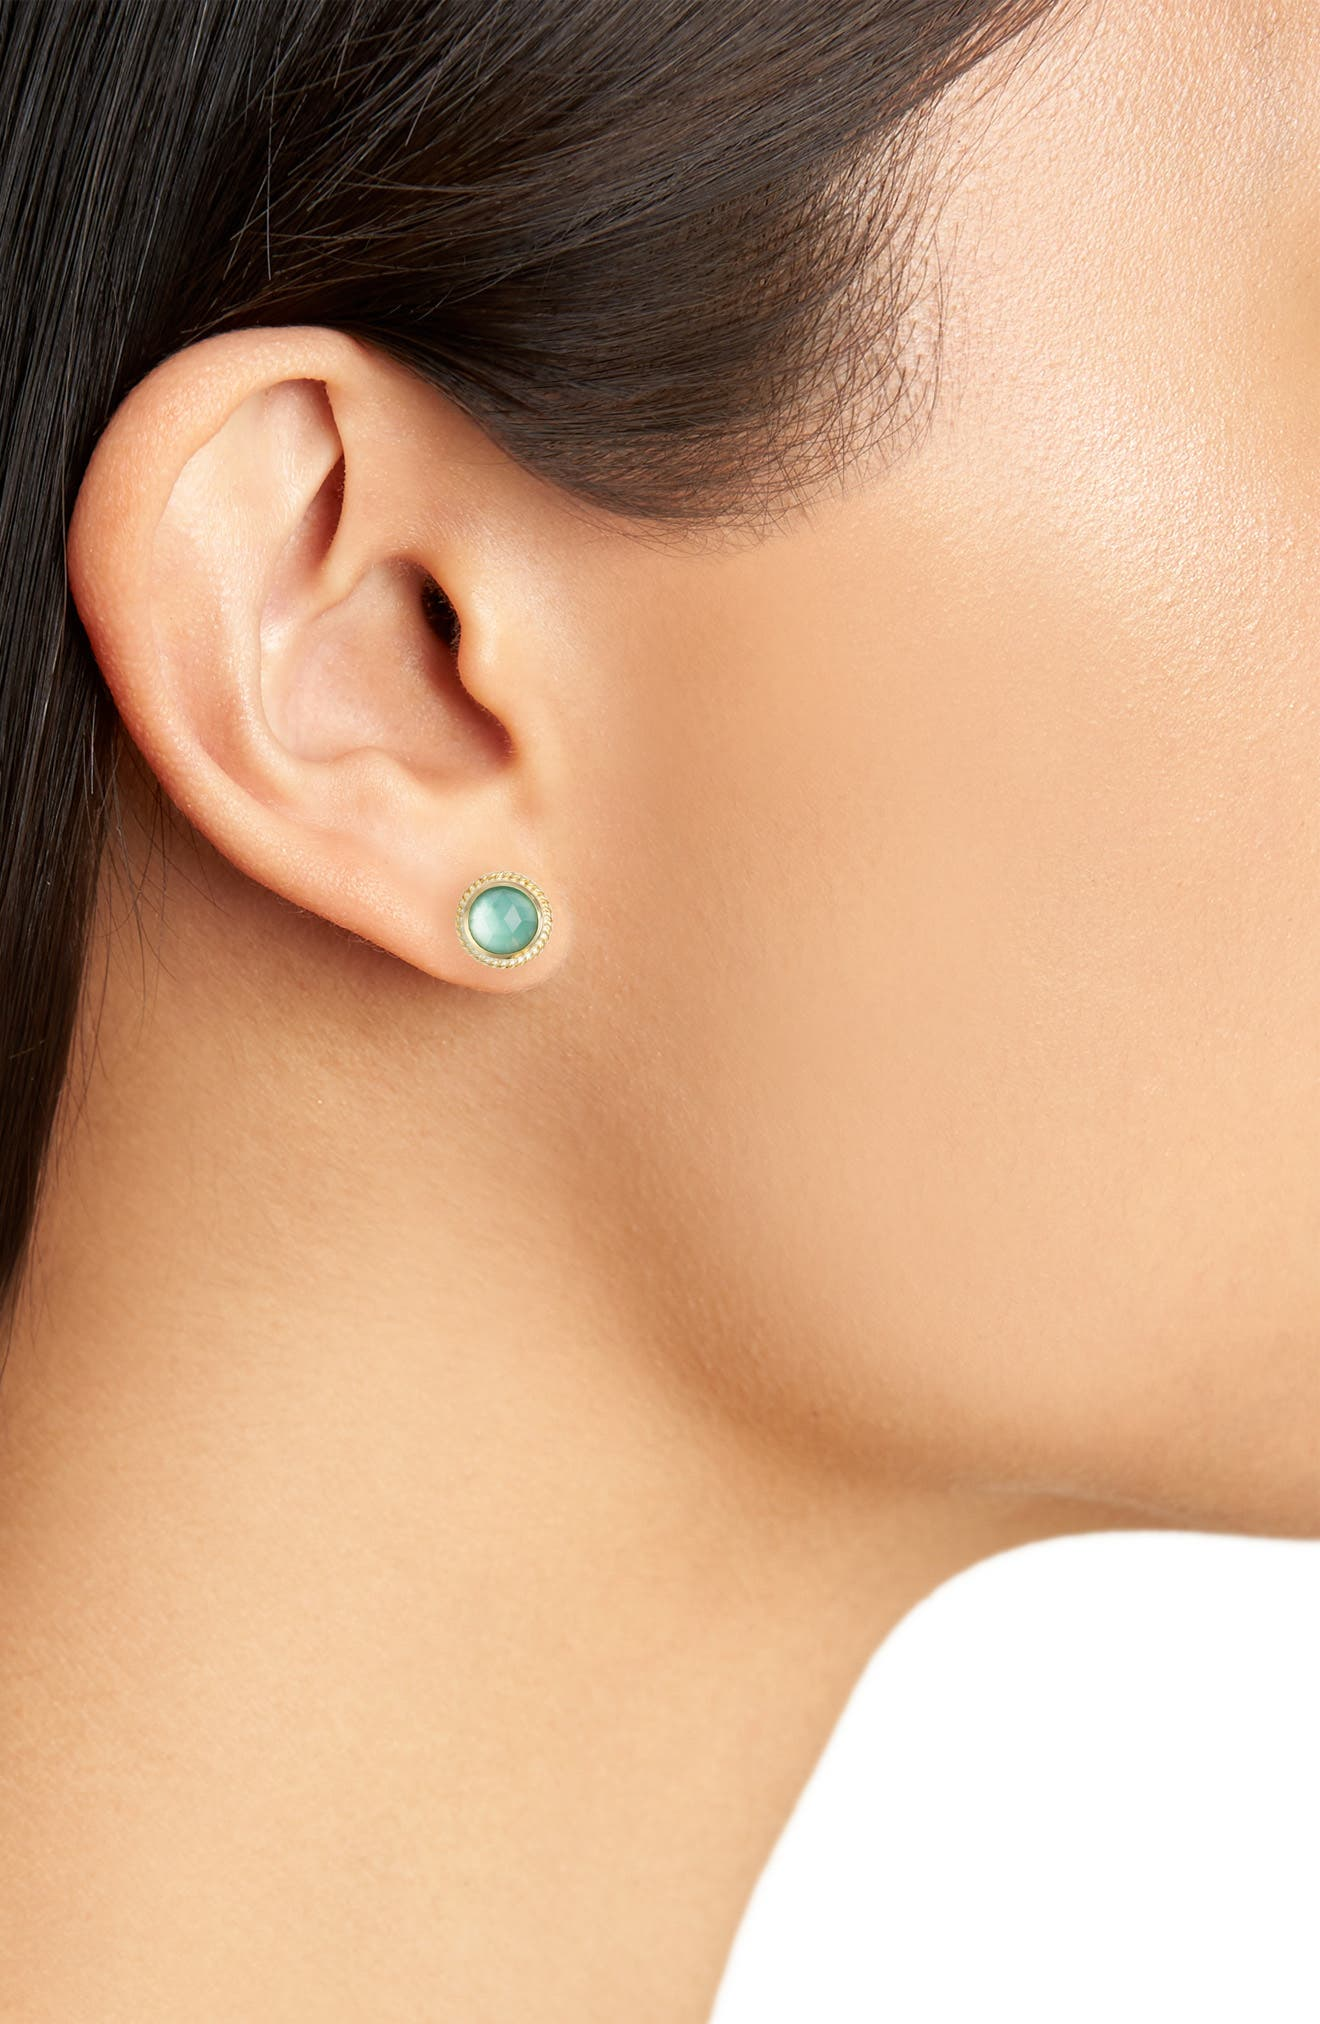 Stone Stud Earrings,                             Alternate thumbnail 2, color,                             300